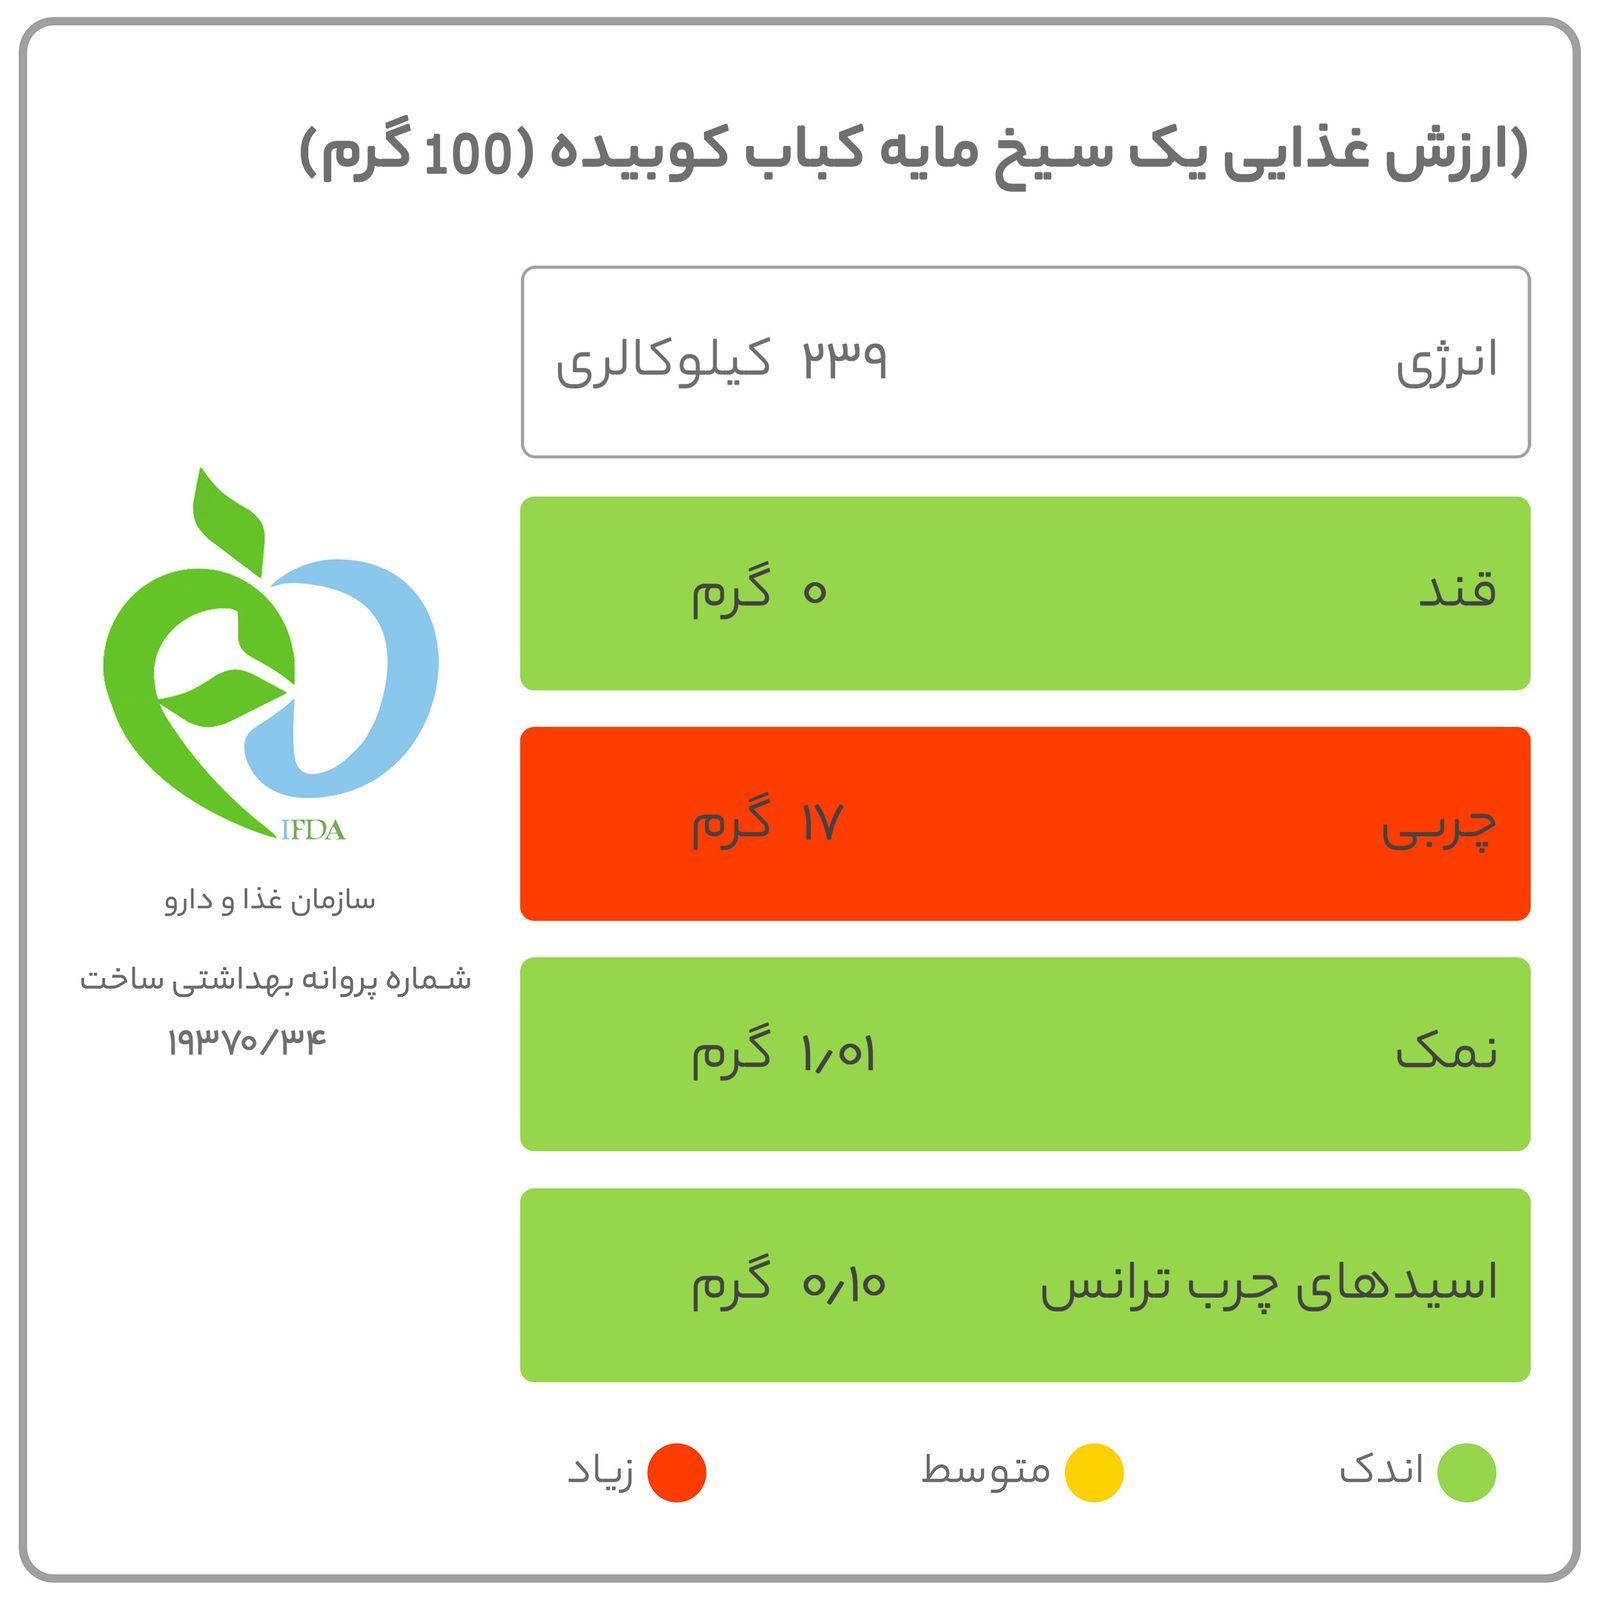 مایه کباب کوبیده فارسی - 1 کیلوگرم main 1 5